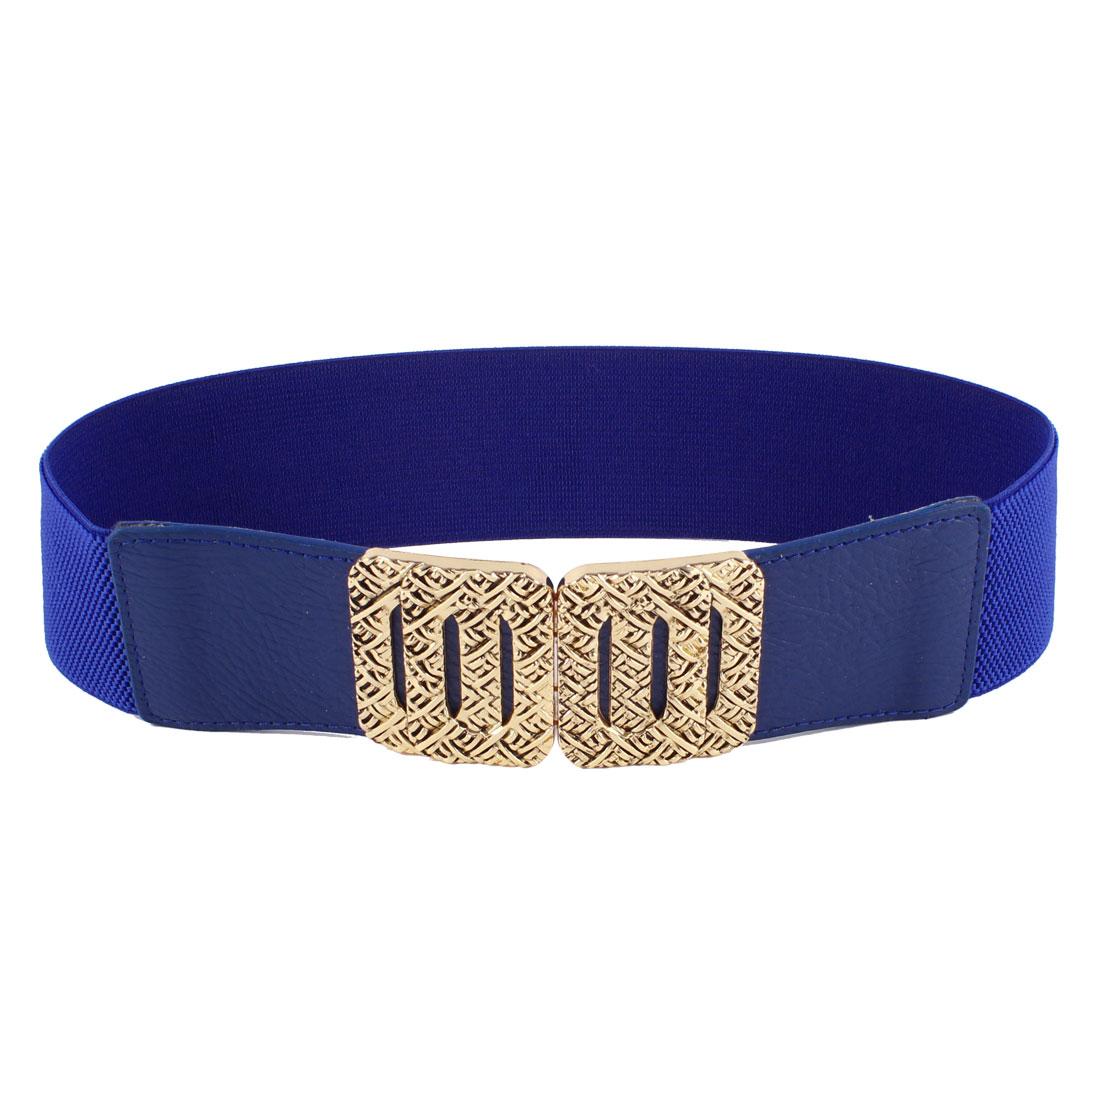 Ladies Rectangle Interlock Closure Textured Waistband Cinch Waist Belt Blue